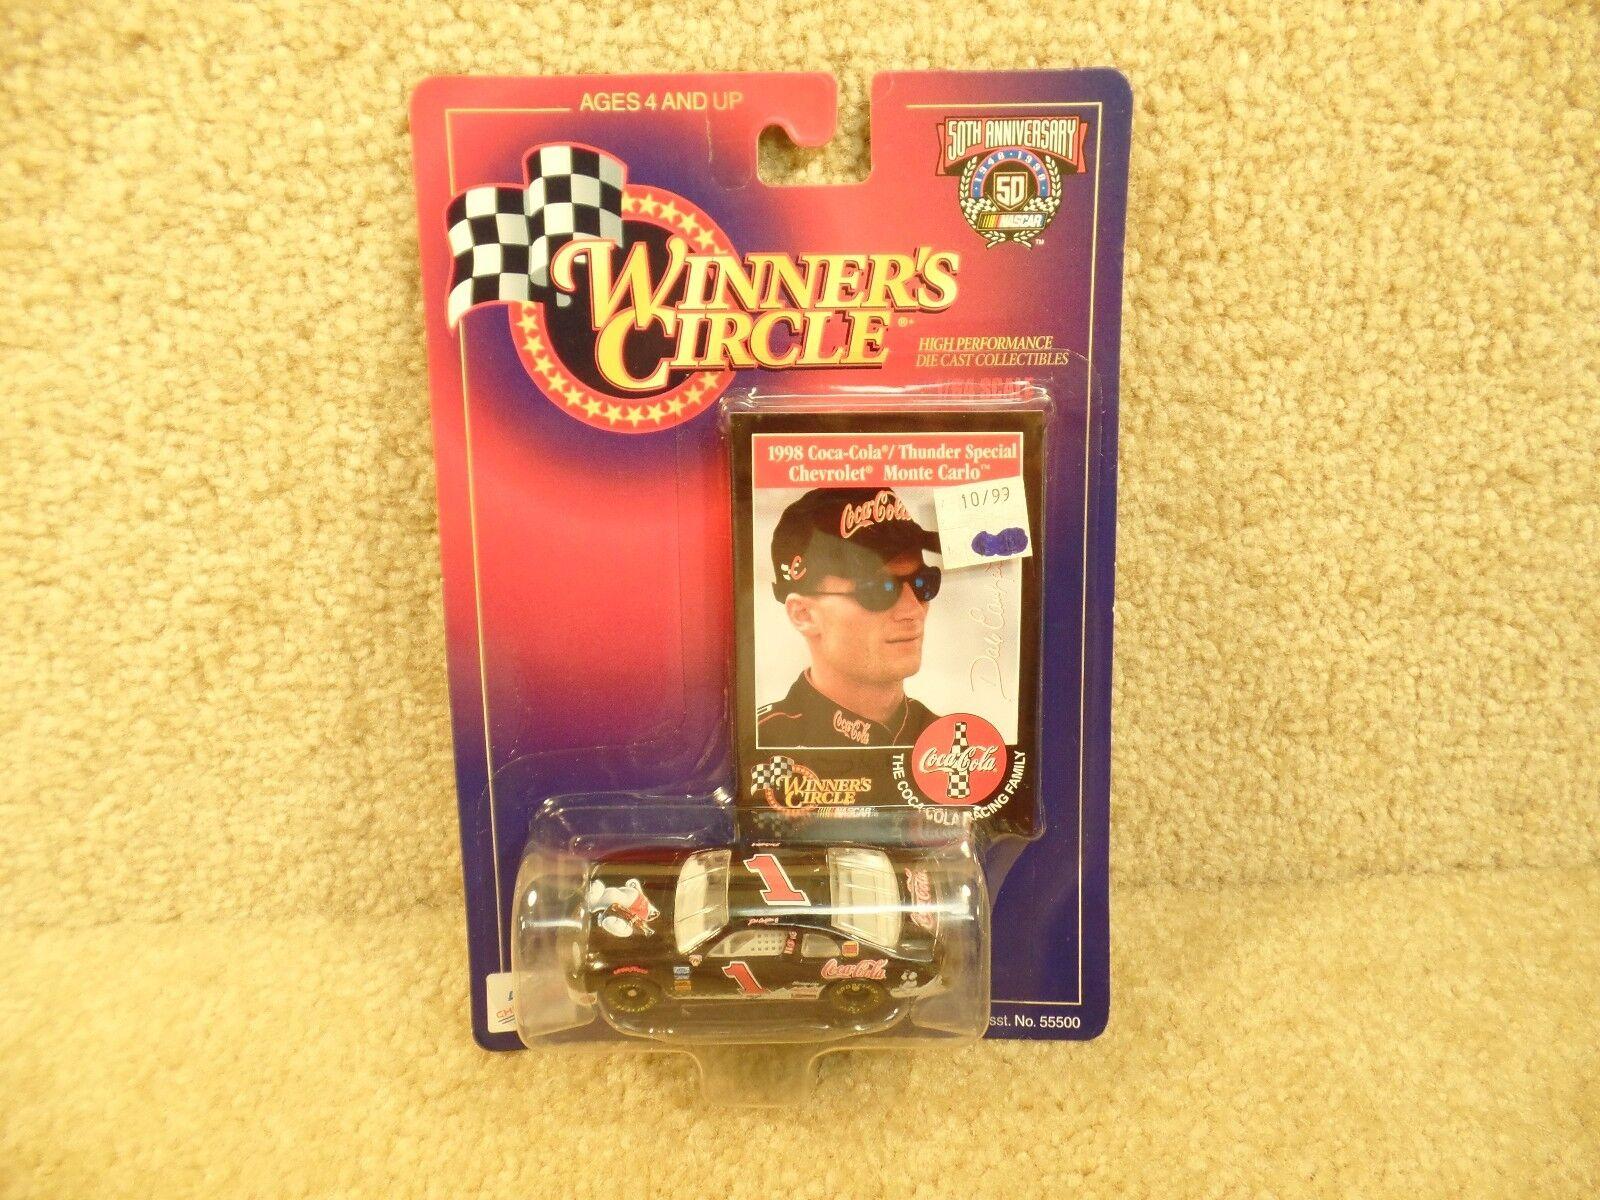 New 1998 Winners Circle 1 64 Diecast NASCAR Dale Earnhardt Jr Coke Polar Bear